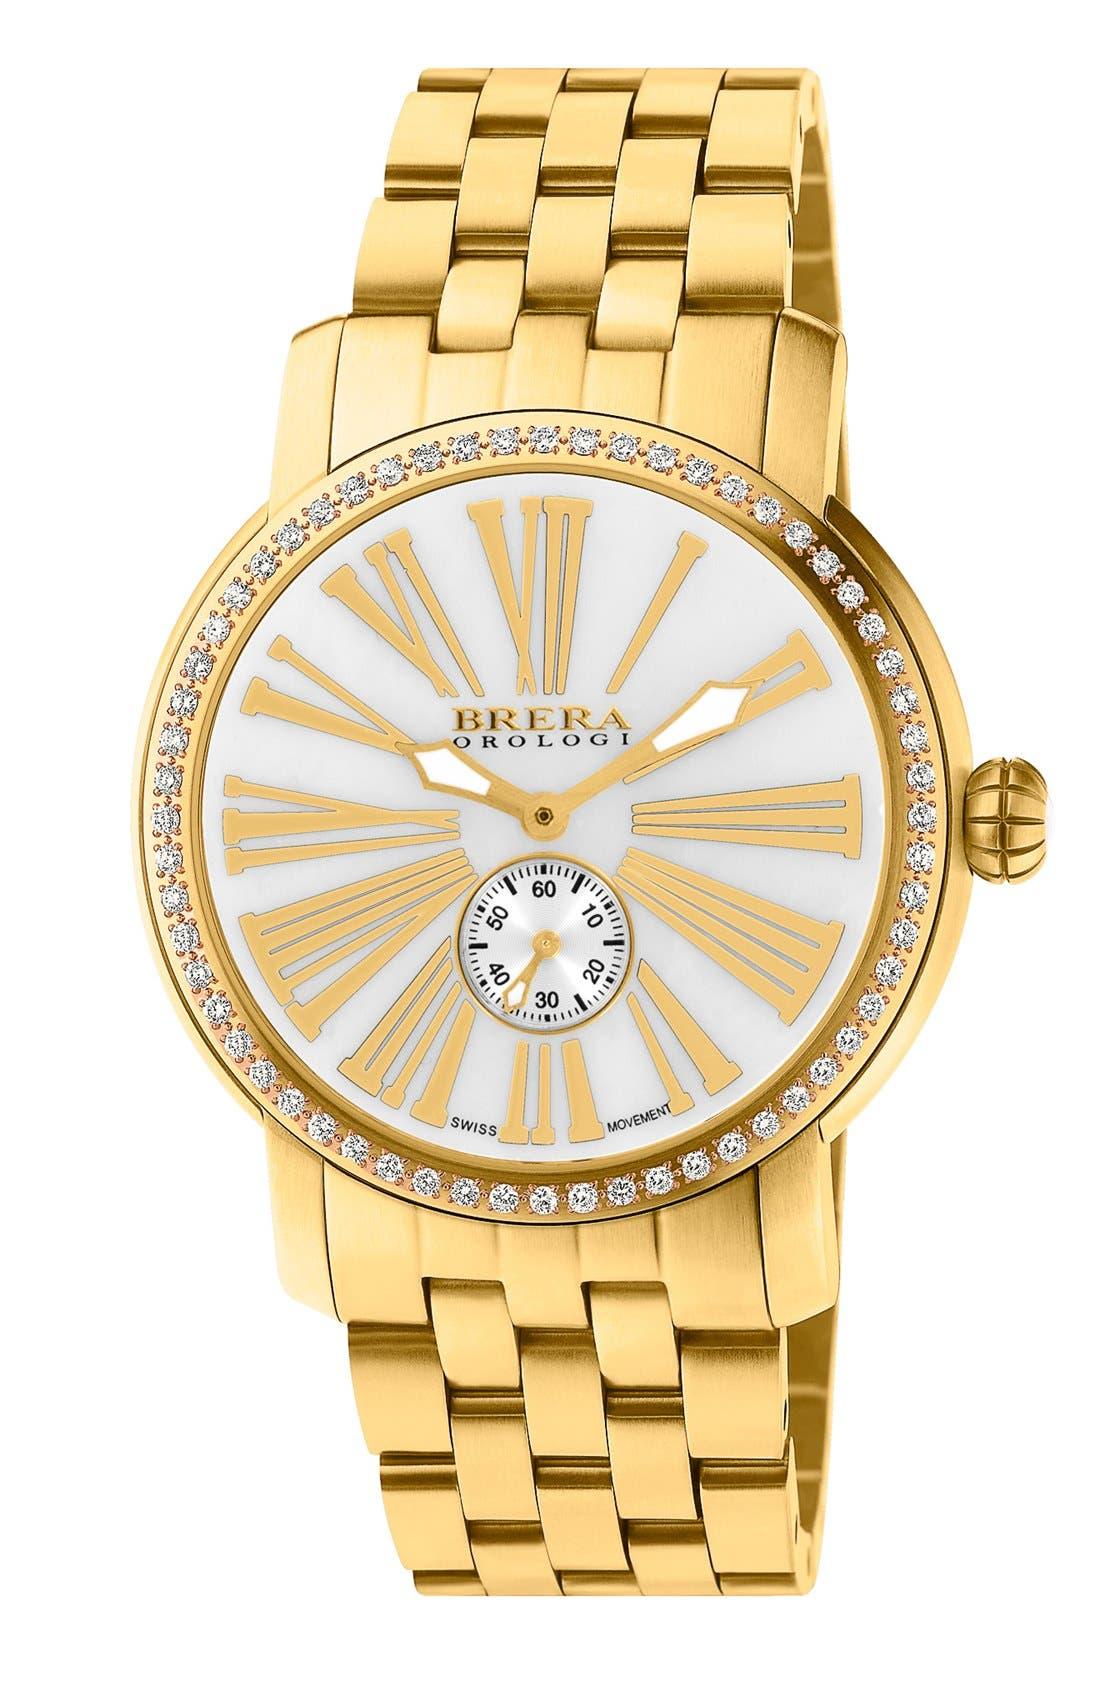 Main Image - Brera 'Valentina' Diamond Bracelet Watch, 42mm